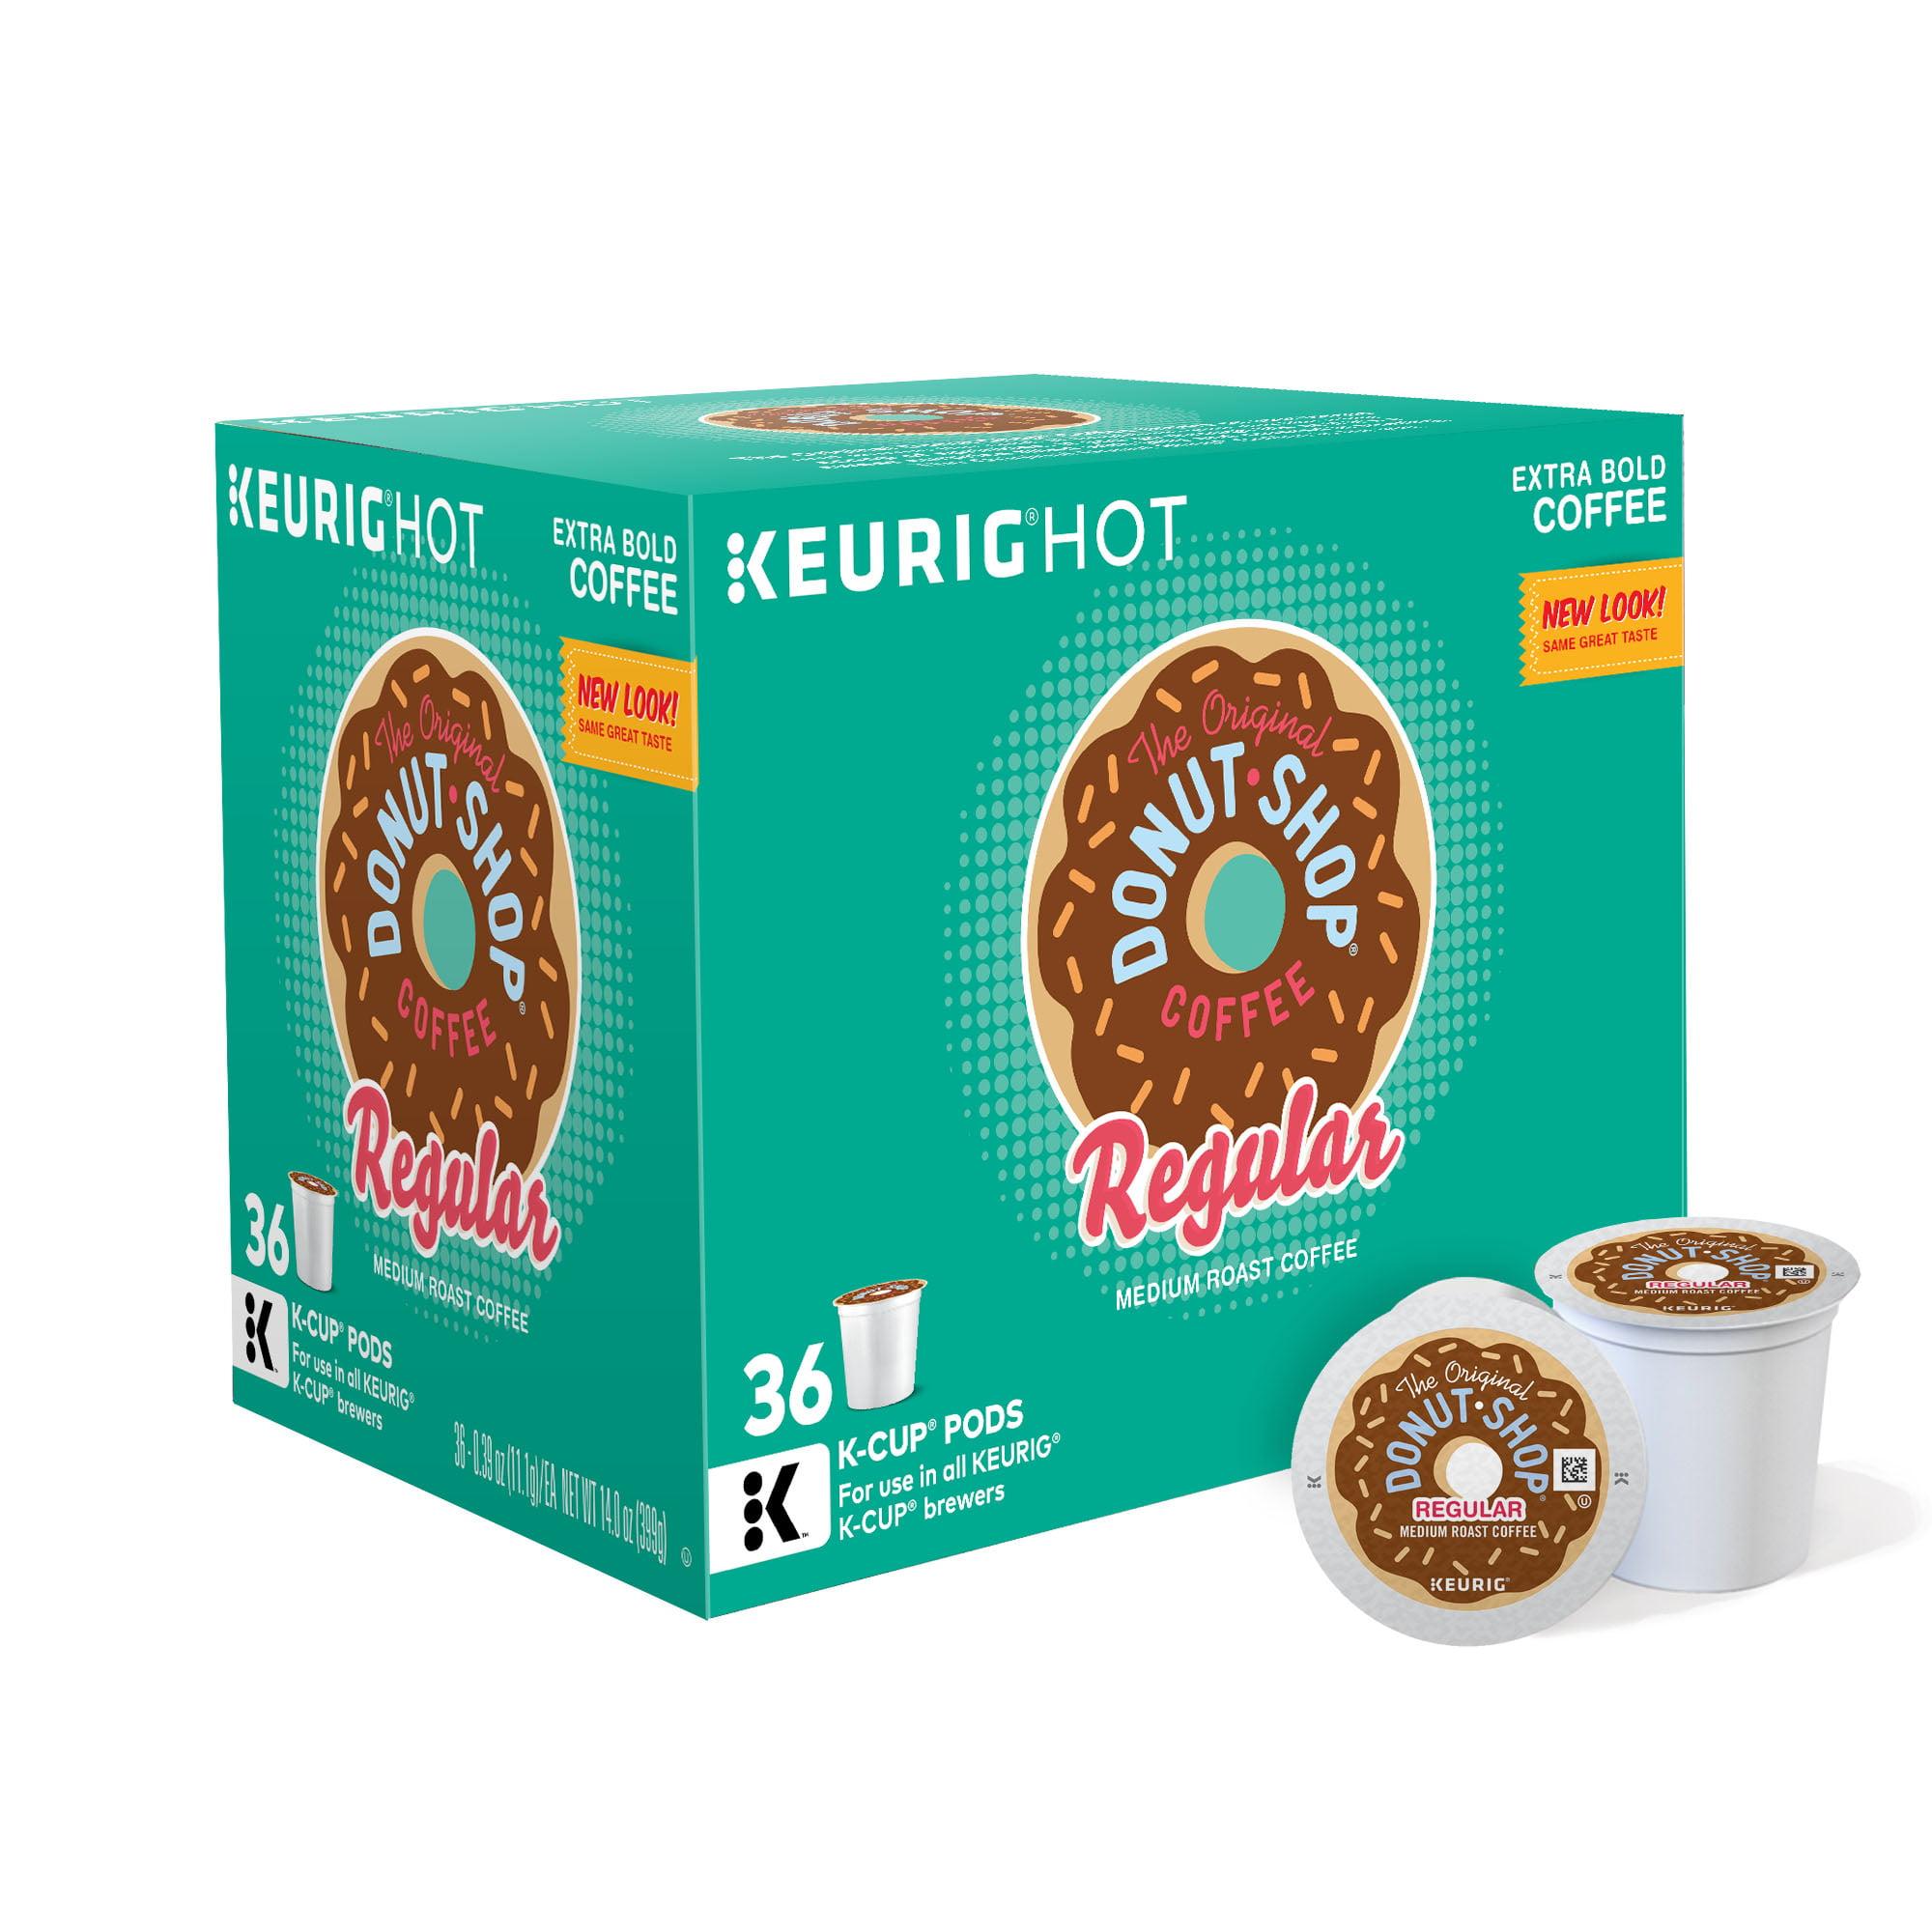 The Original Donut Shop Coffee Regular Keurig Single-Serve K-Cup Pods, Medium Roast